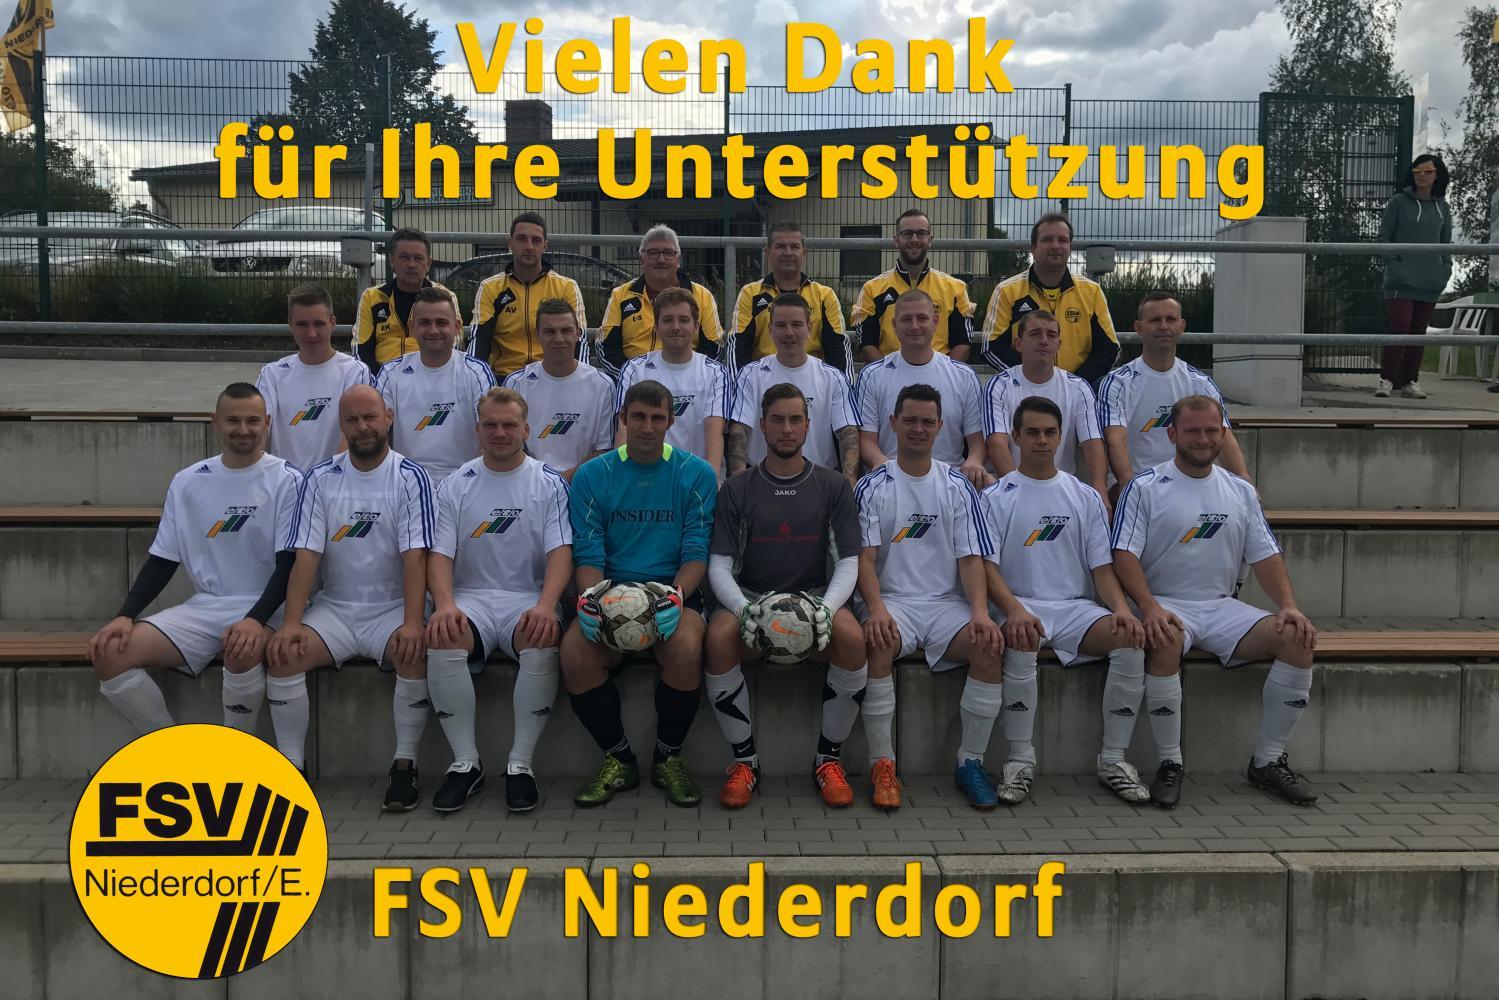 FSV Niederdorf e.V.